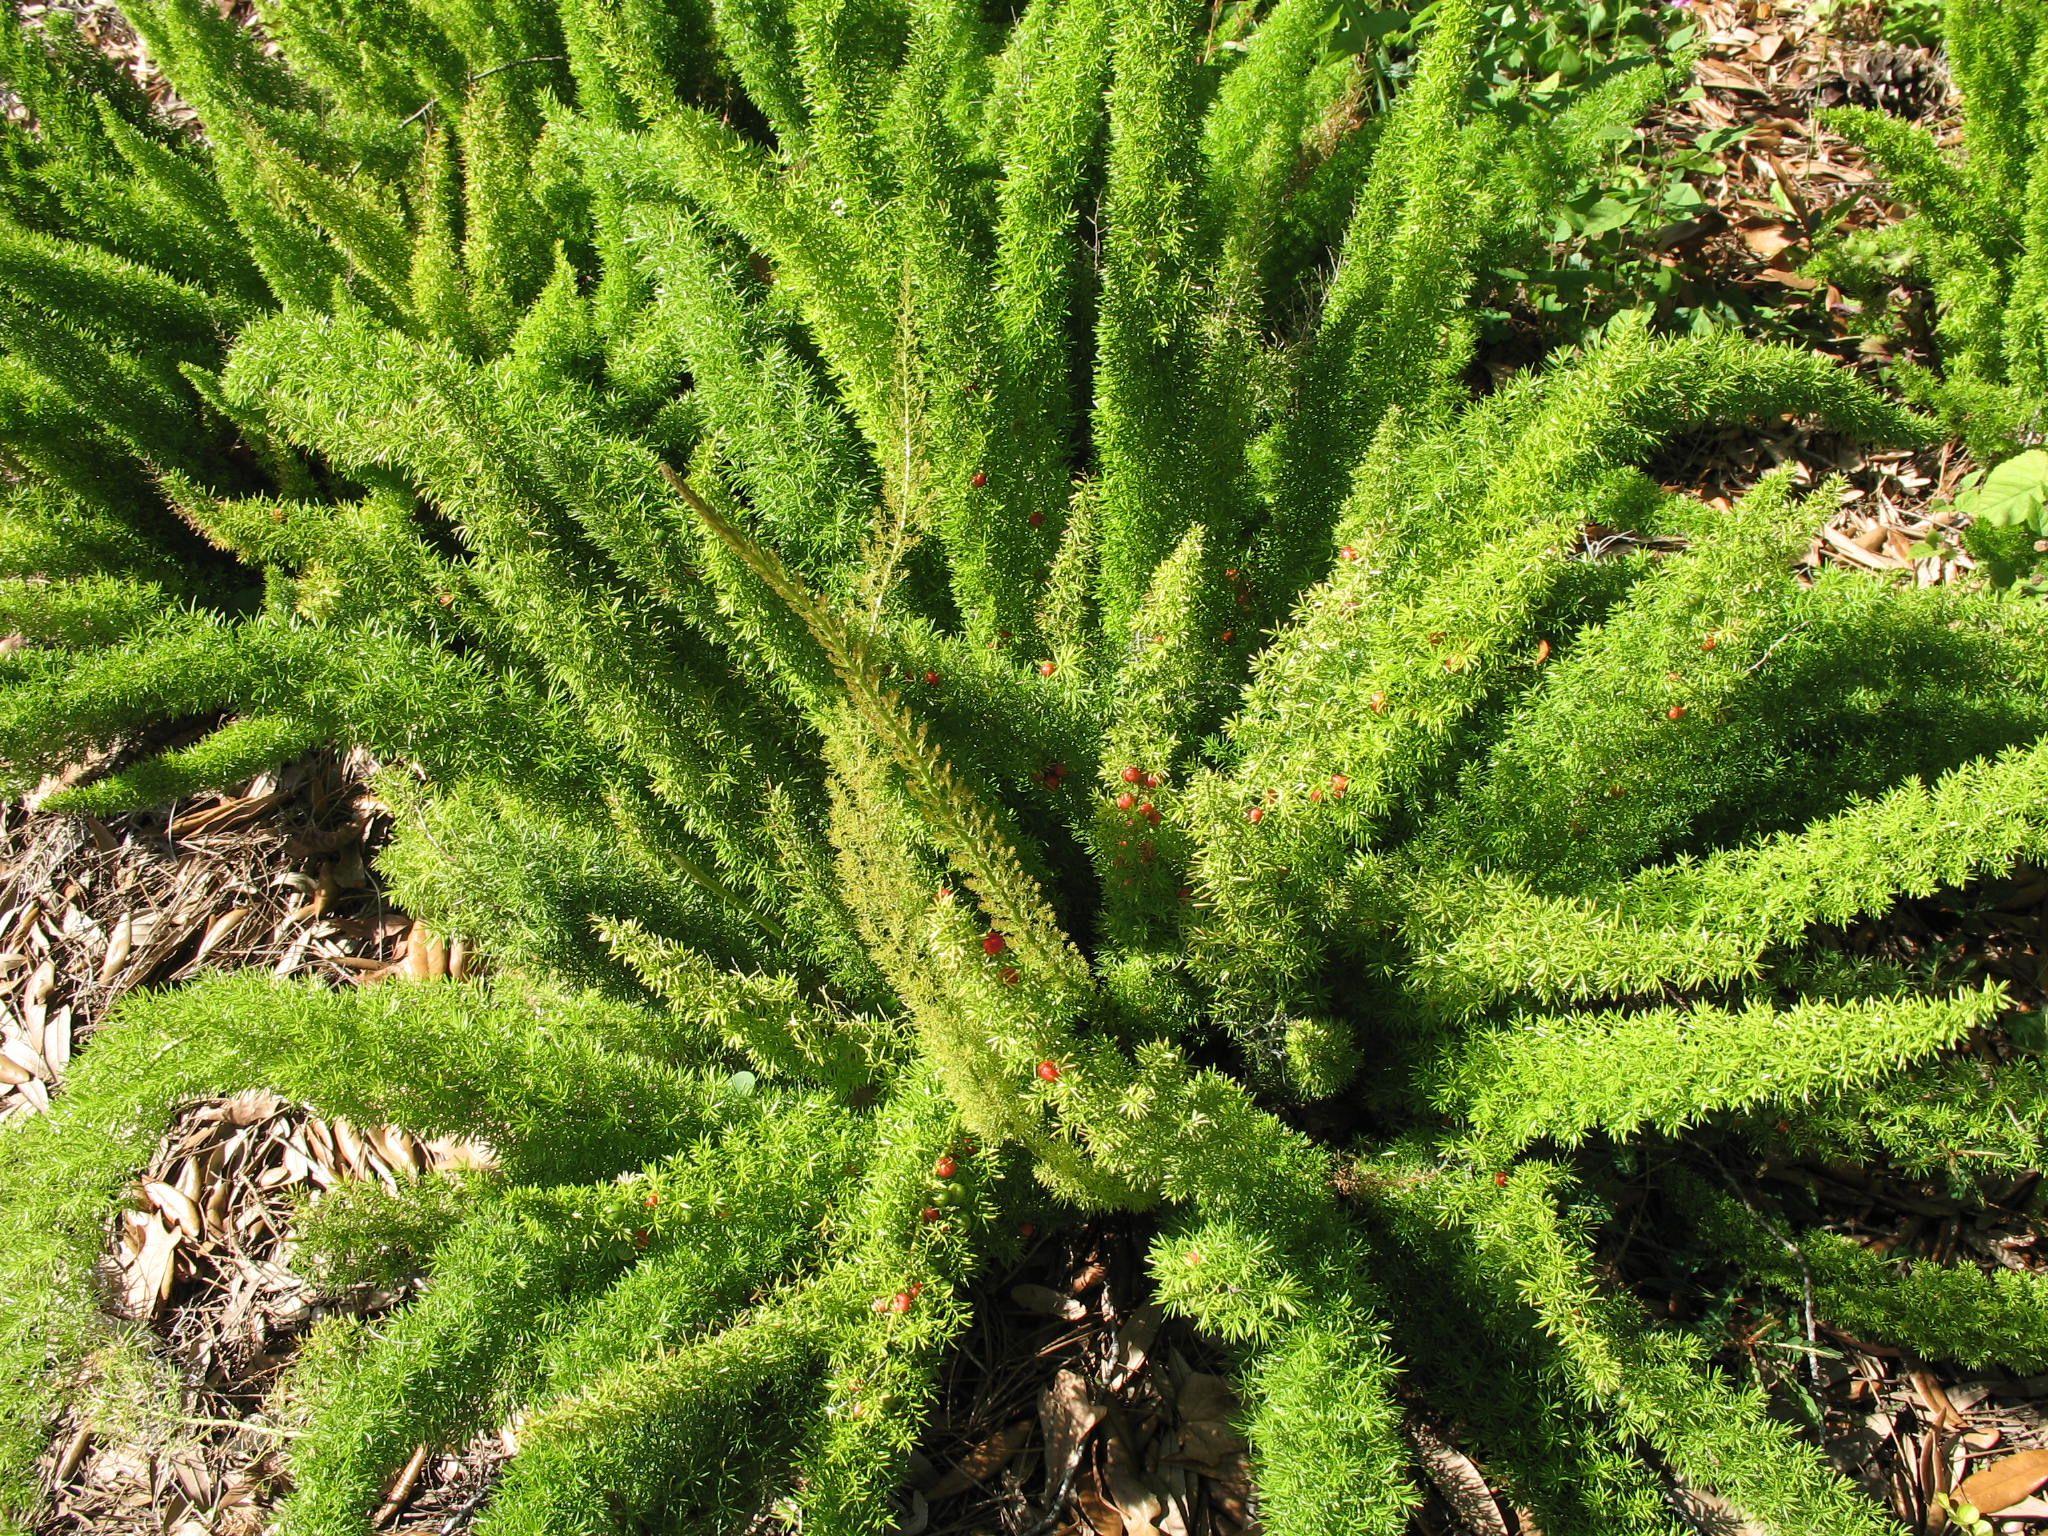 Foxtail Asparagus Fern Asperagus Densiflorus Meyers 400 x 300